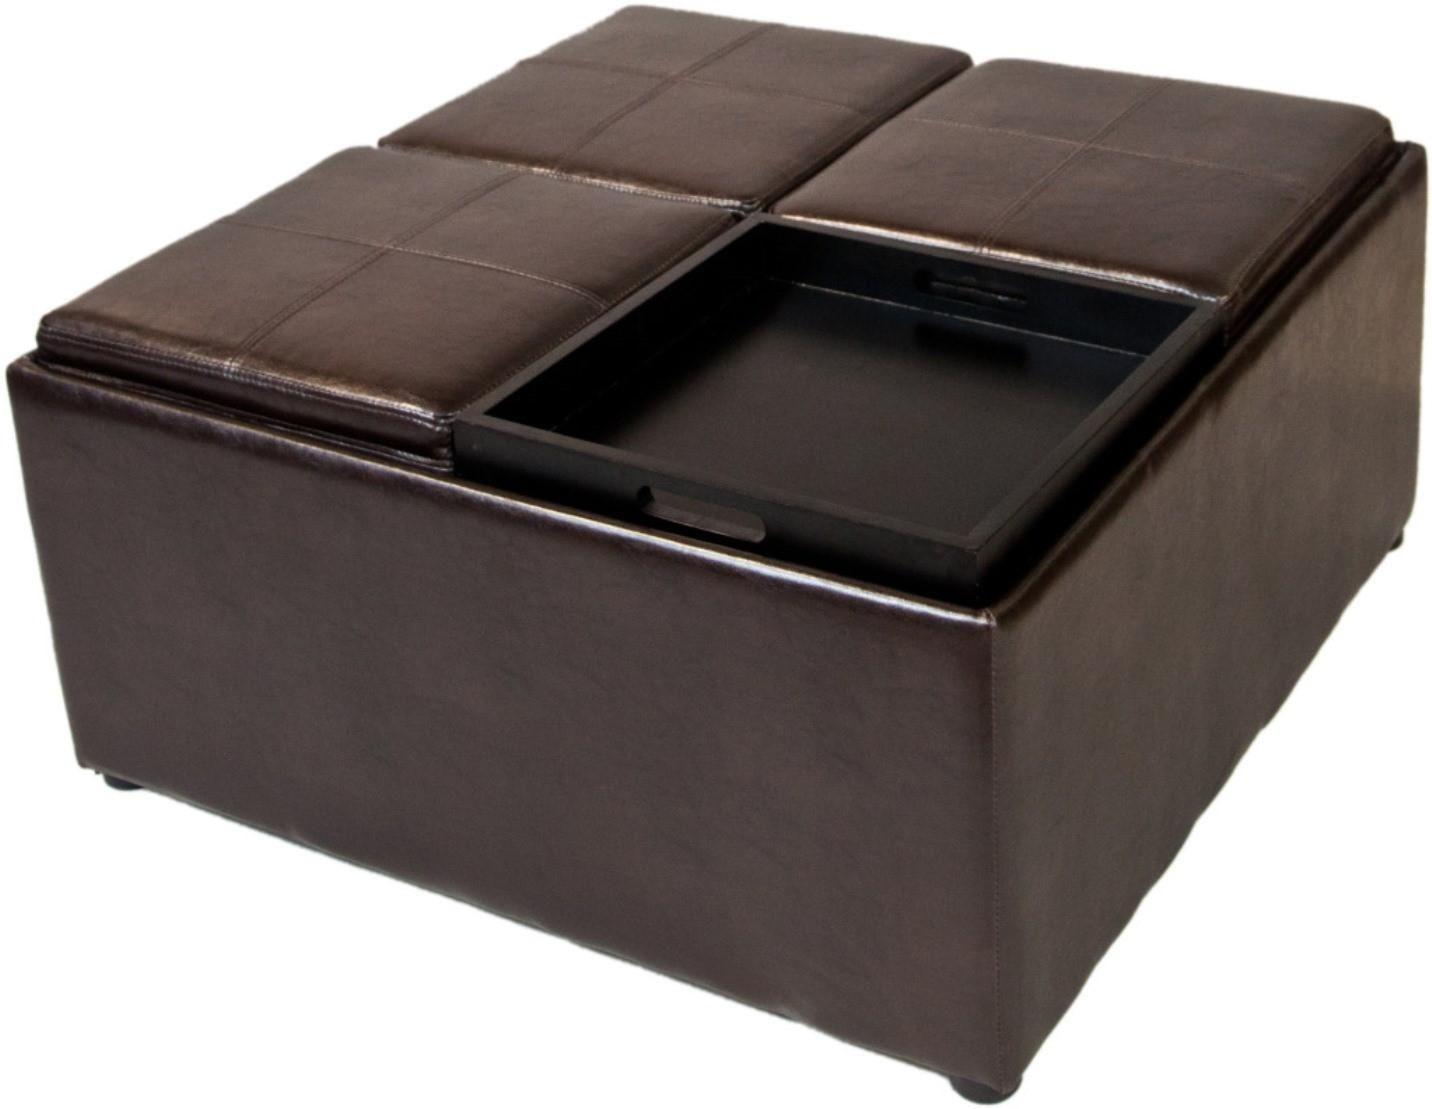 Amazon.com - Simpli Home Avalon Coffee Table Storage Ottoman w/ 4 ...